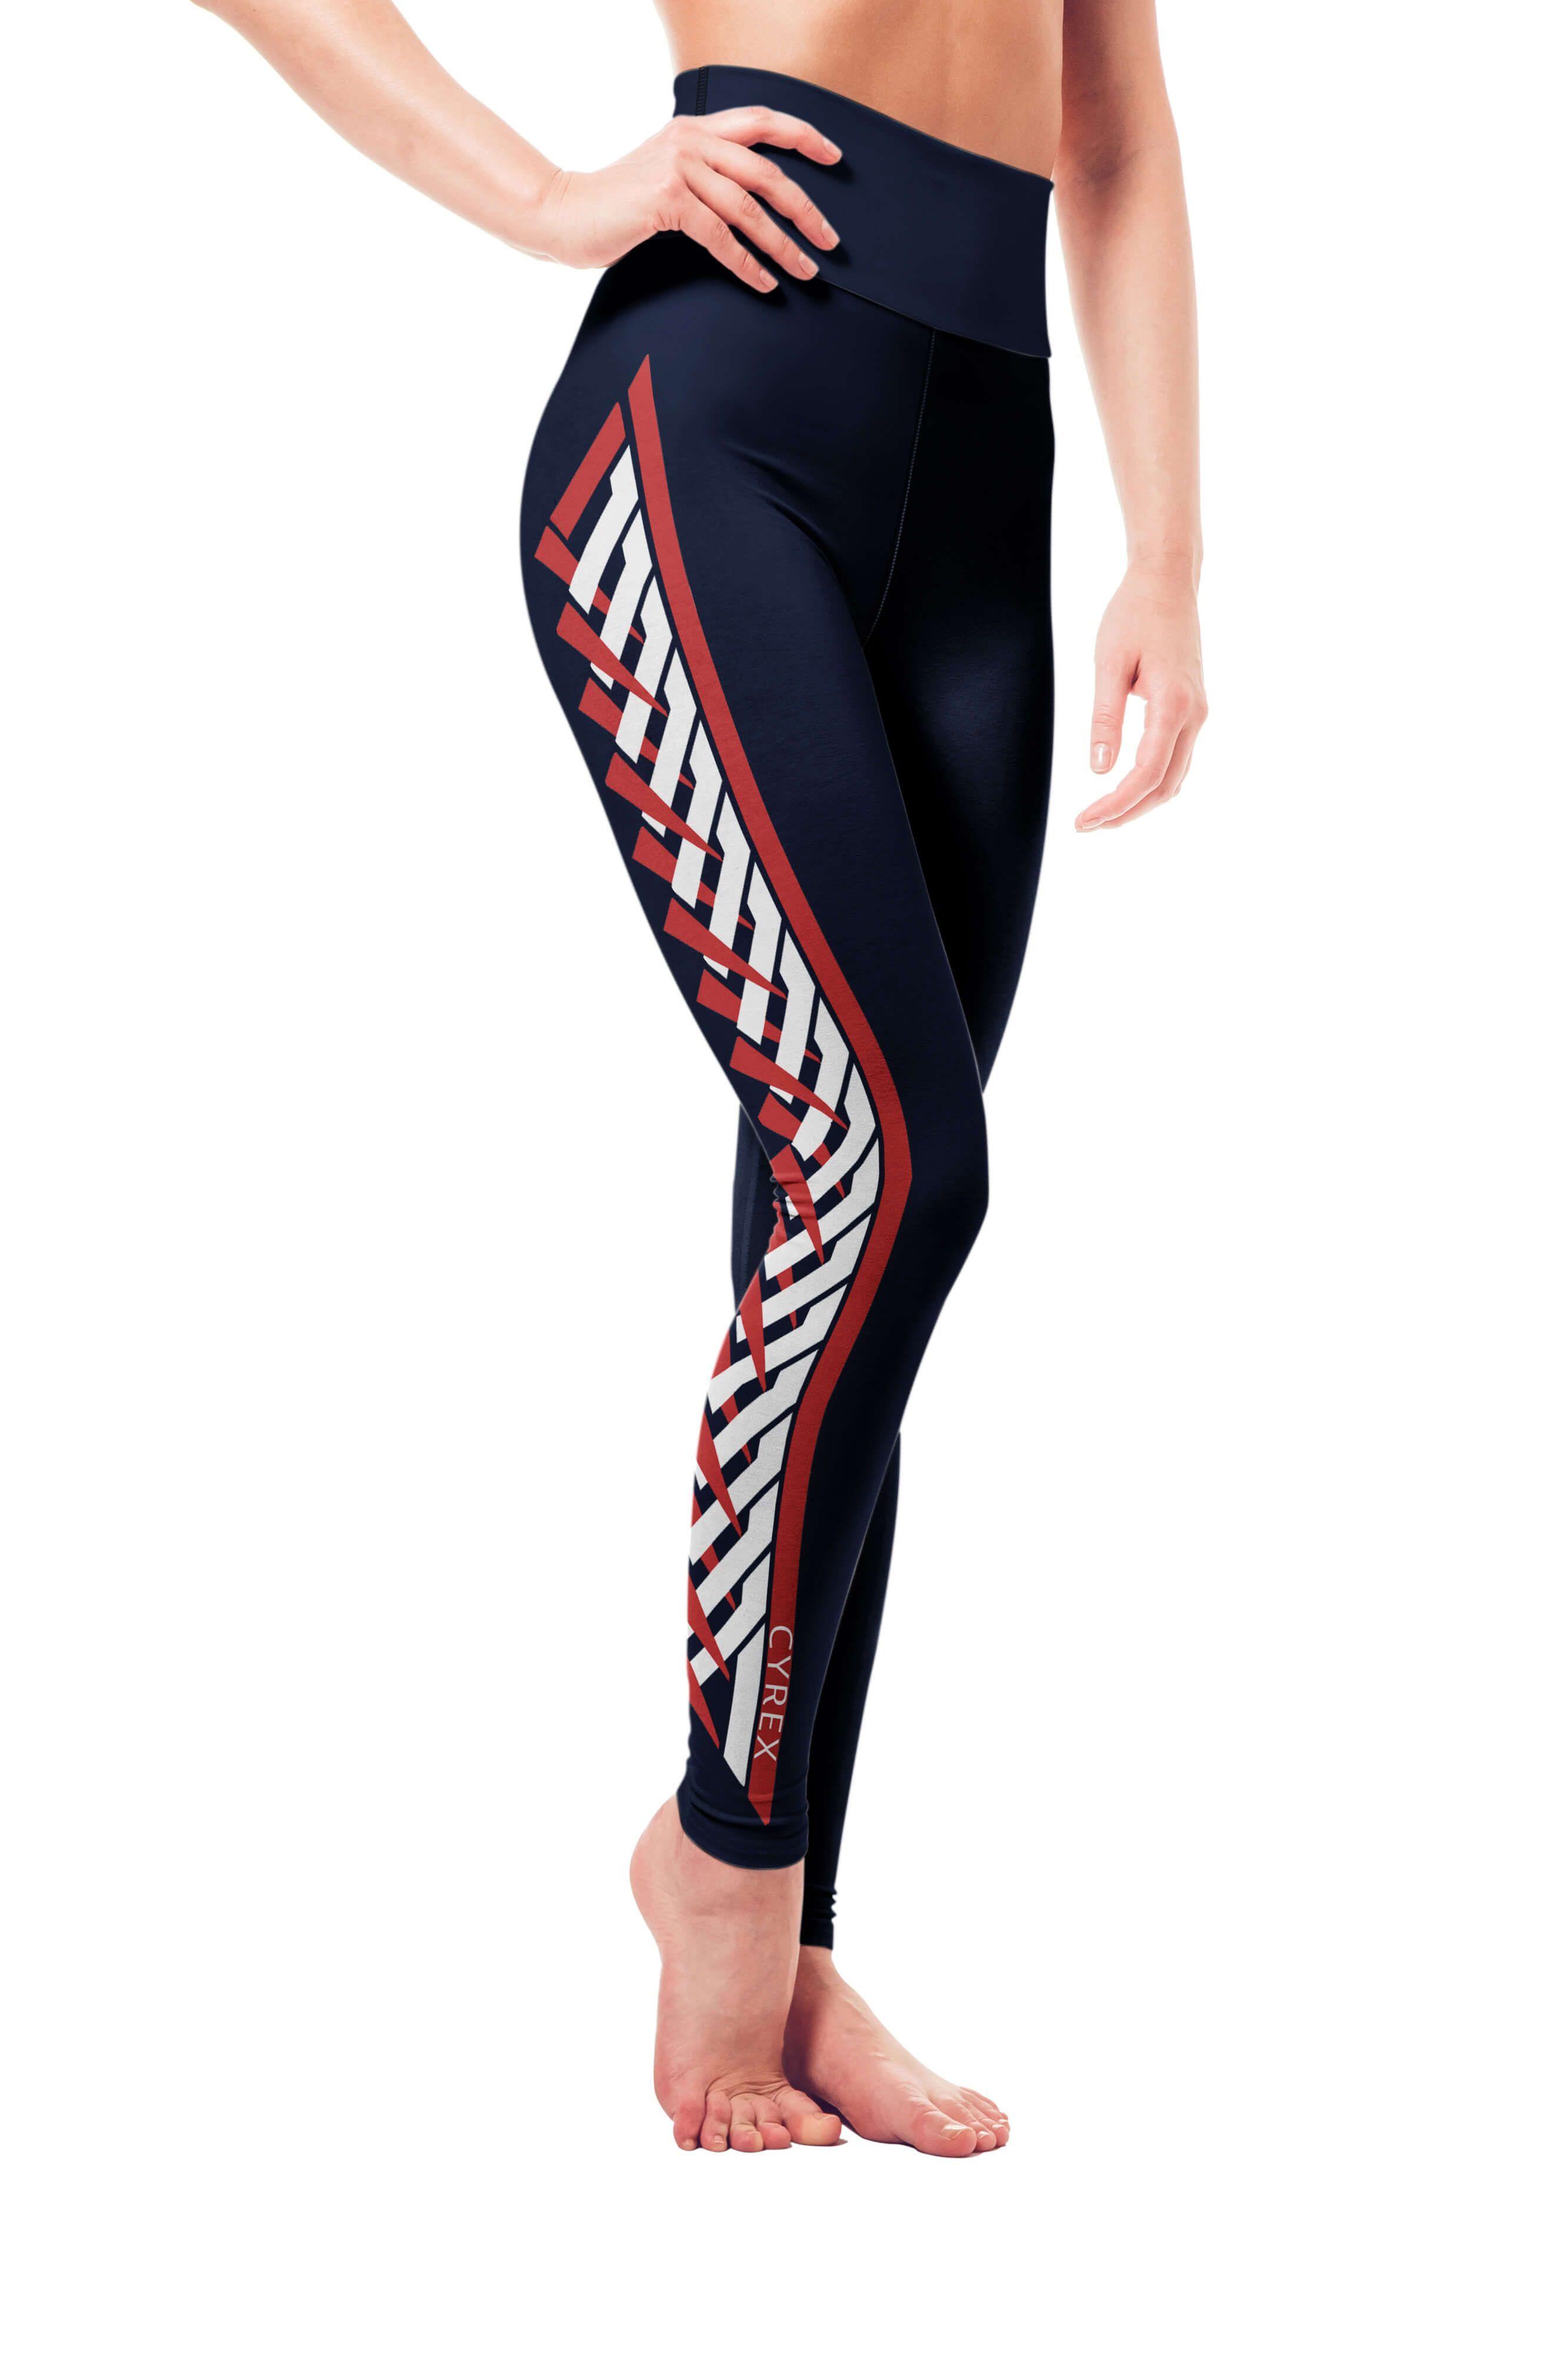 f7fa156b831602 Navy yoga leggings Vosenta Raised waistband leggings #fashion #style # leggings #ootd